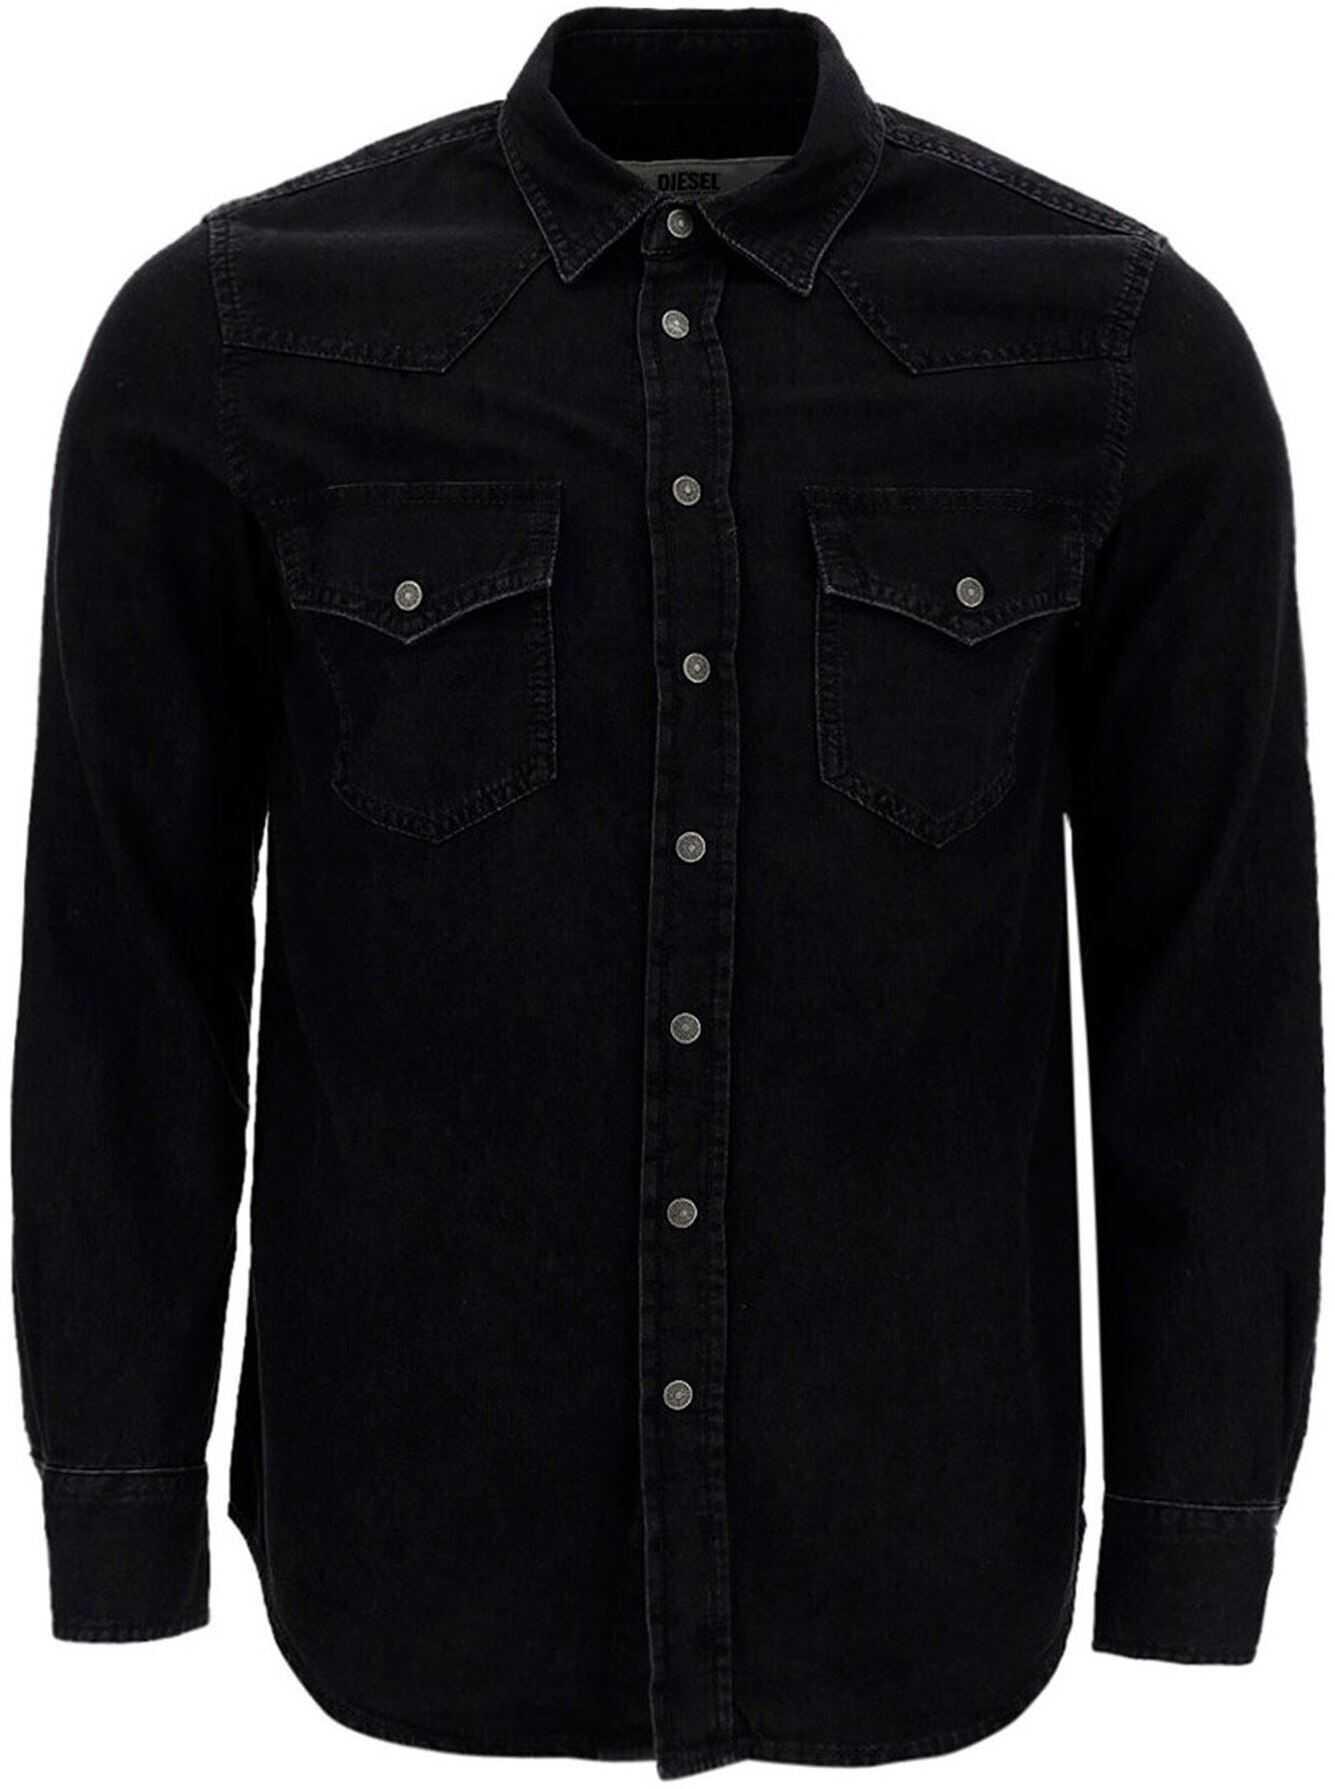 Diesel Denim D-East-P1 Shirt In Black Black imagine